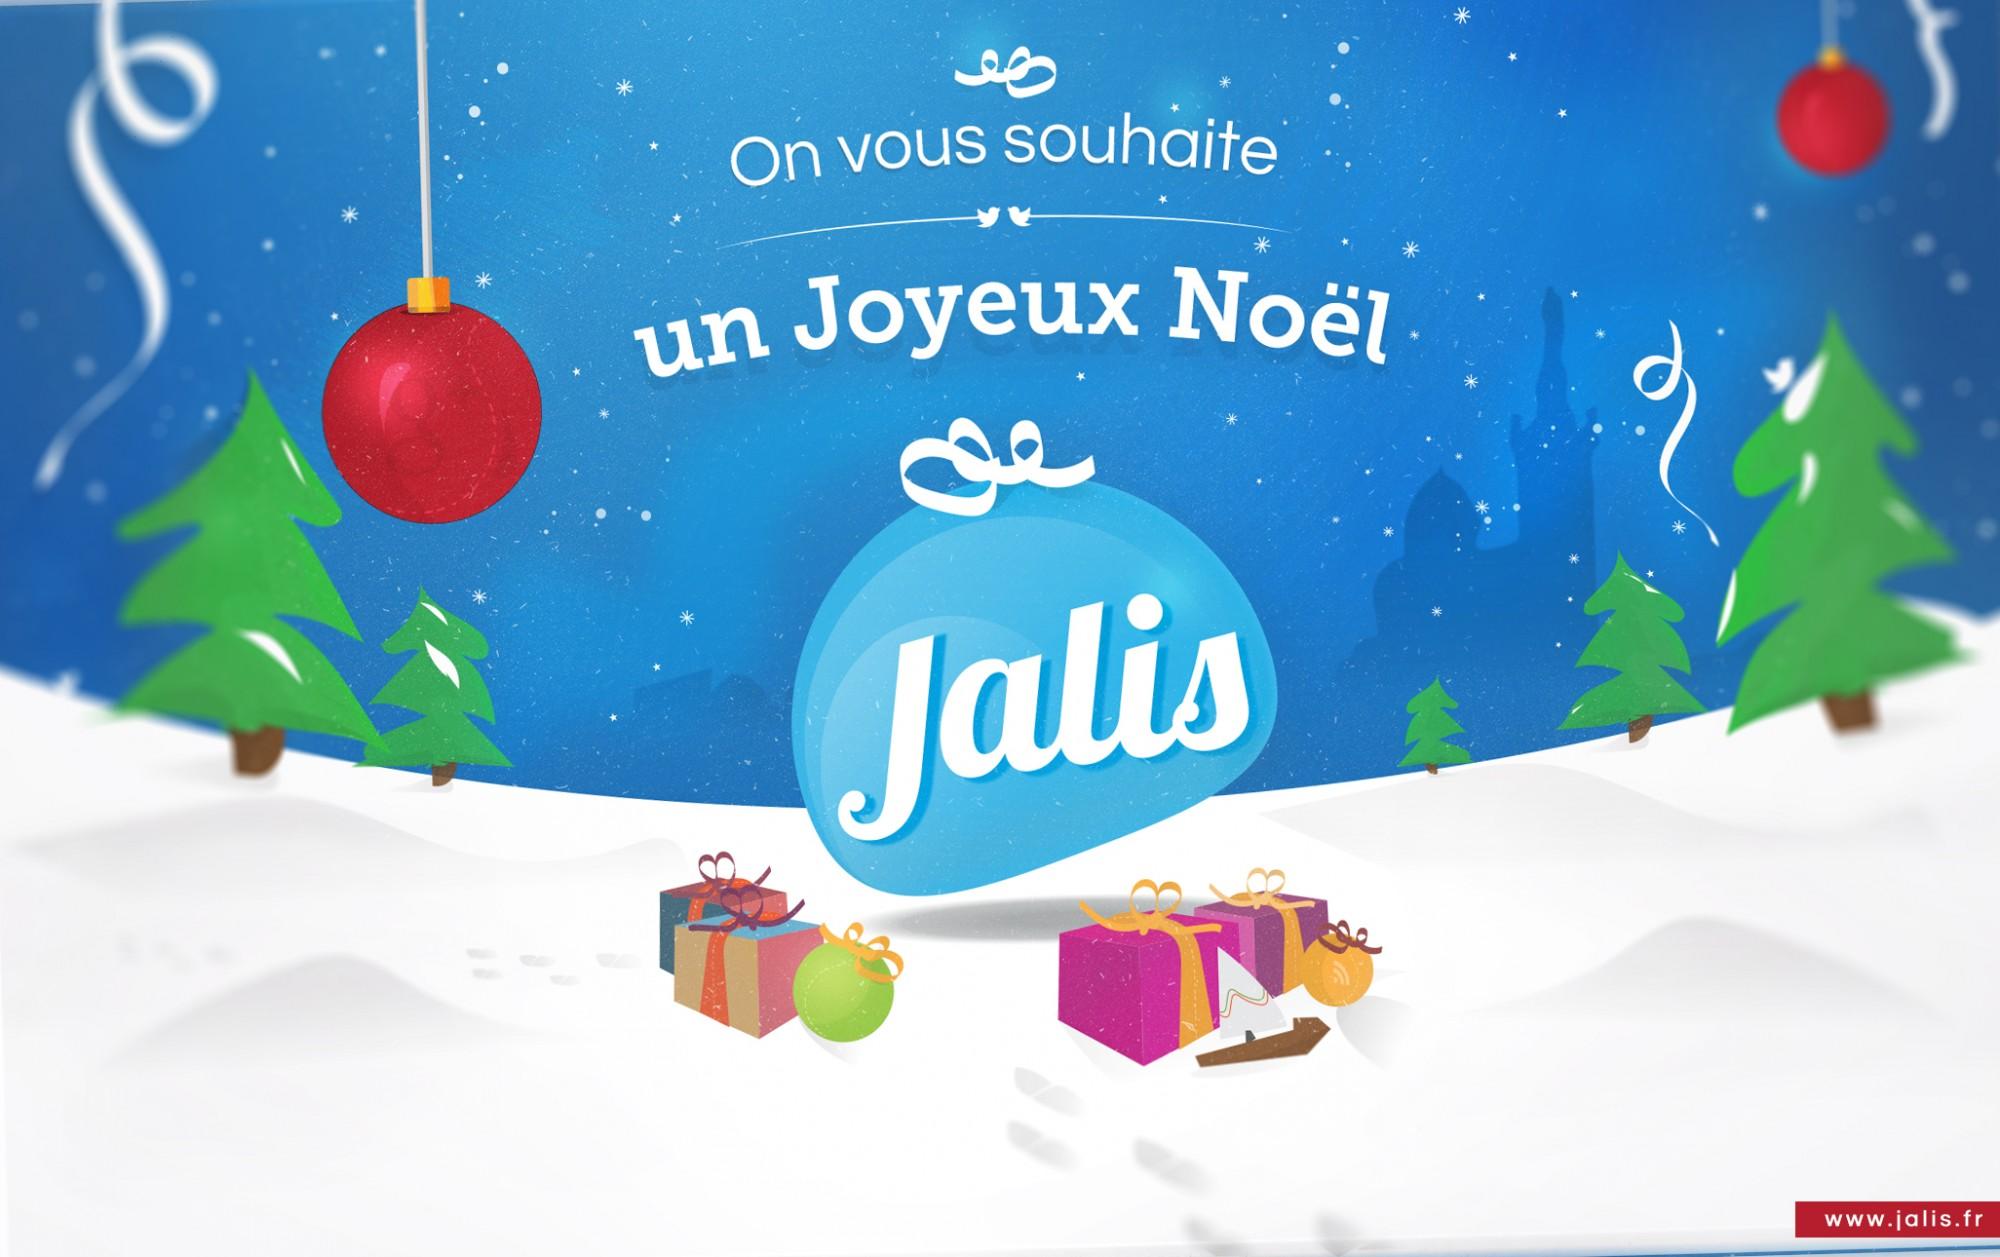 Carte de Noël 2015 de Jalis